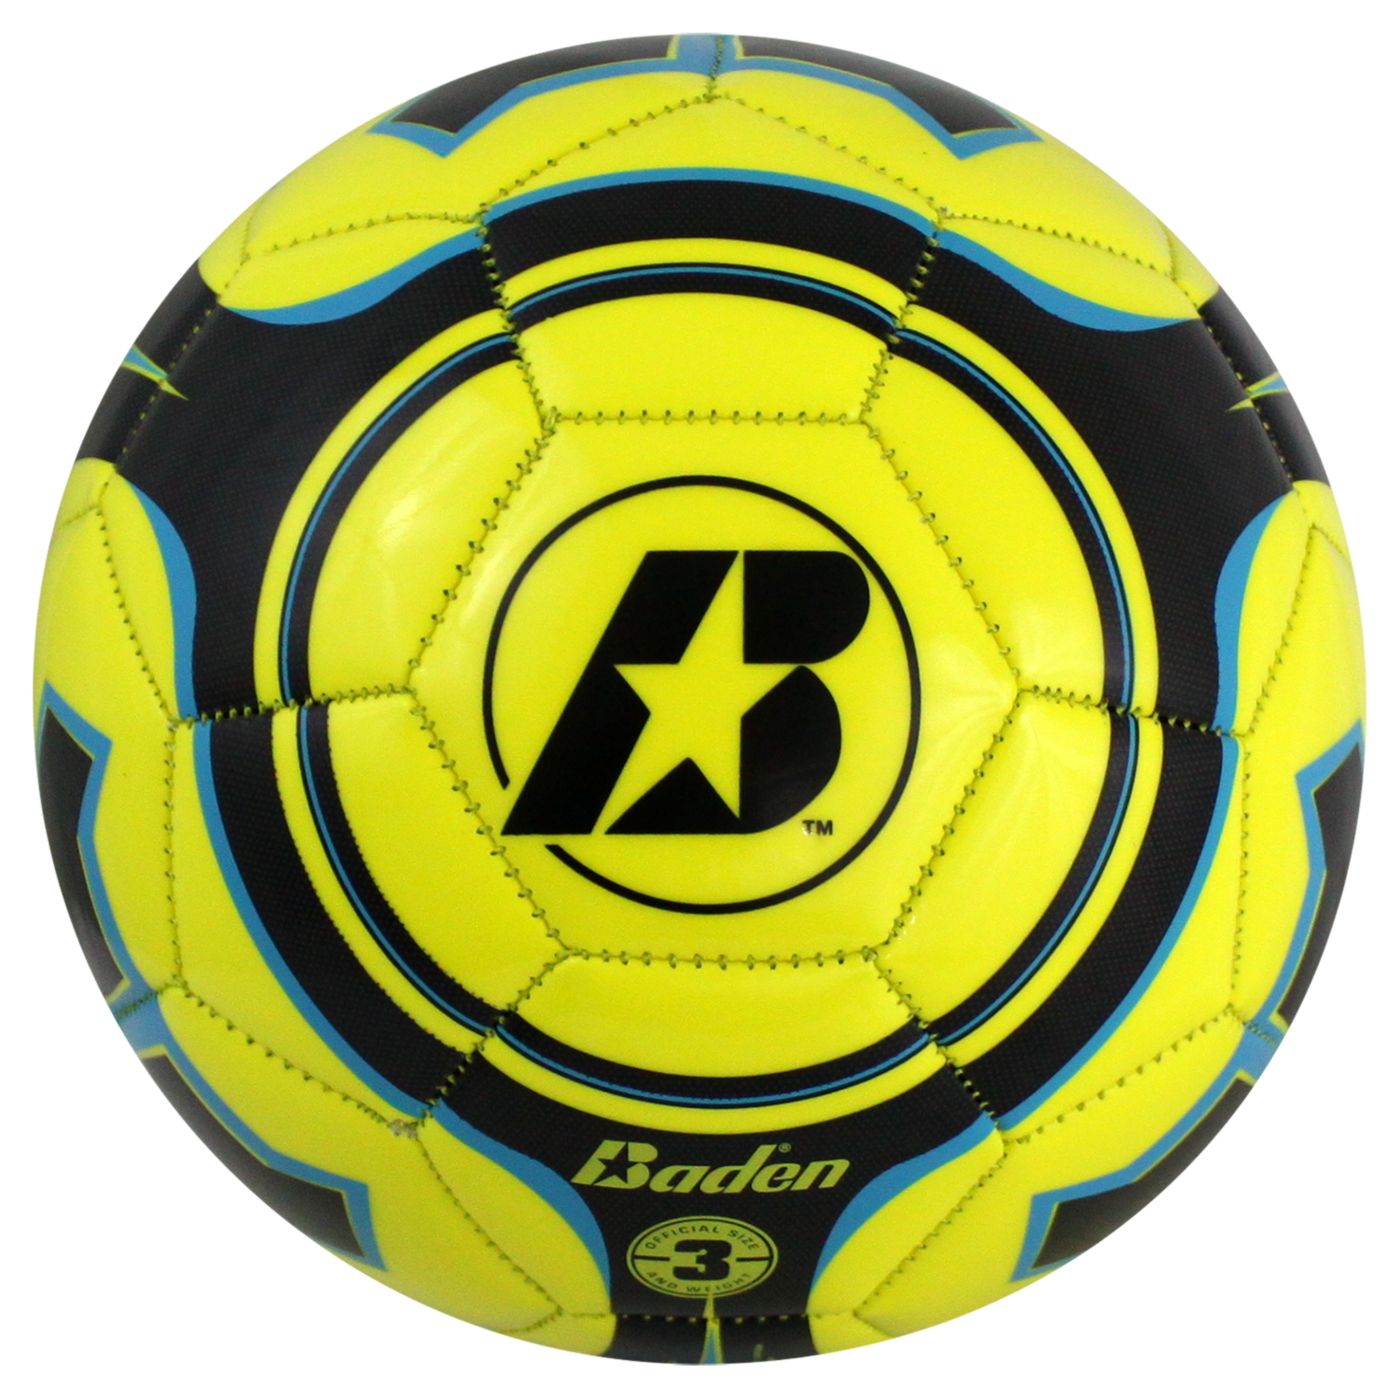 Baden Z-Series Soccer Ball